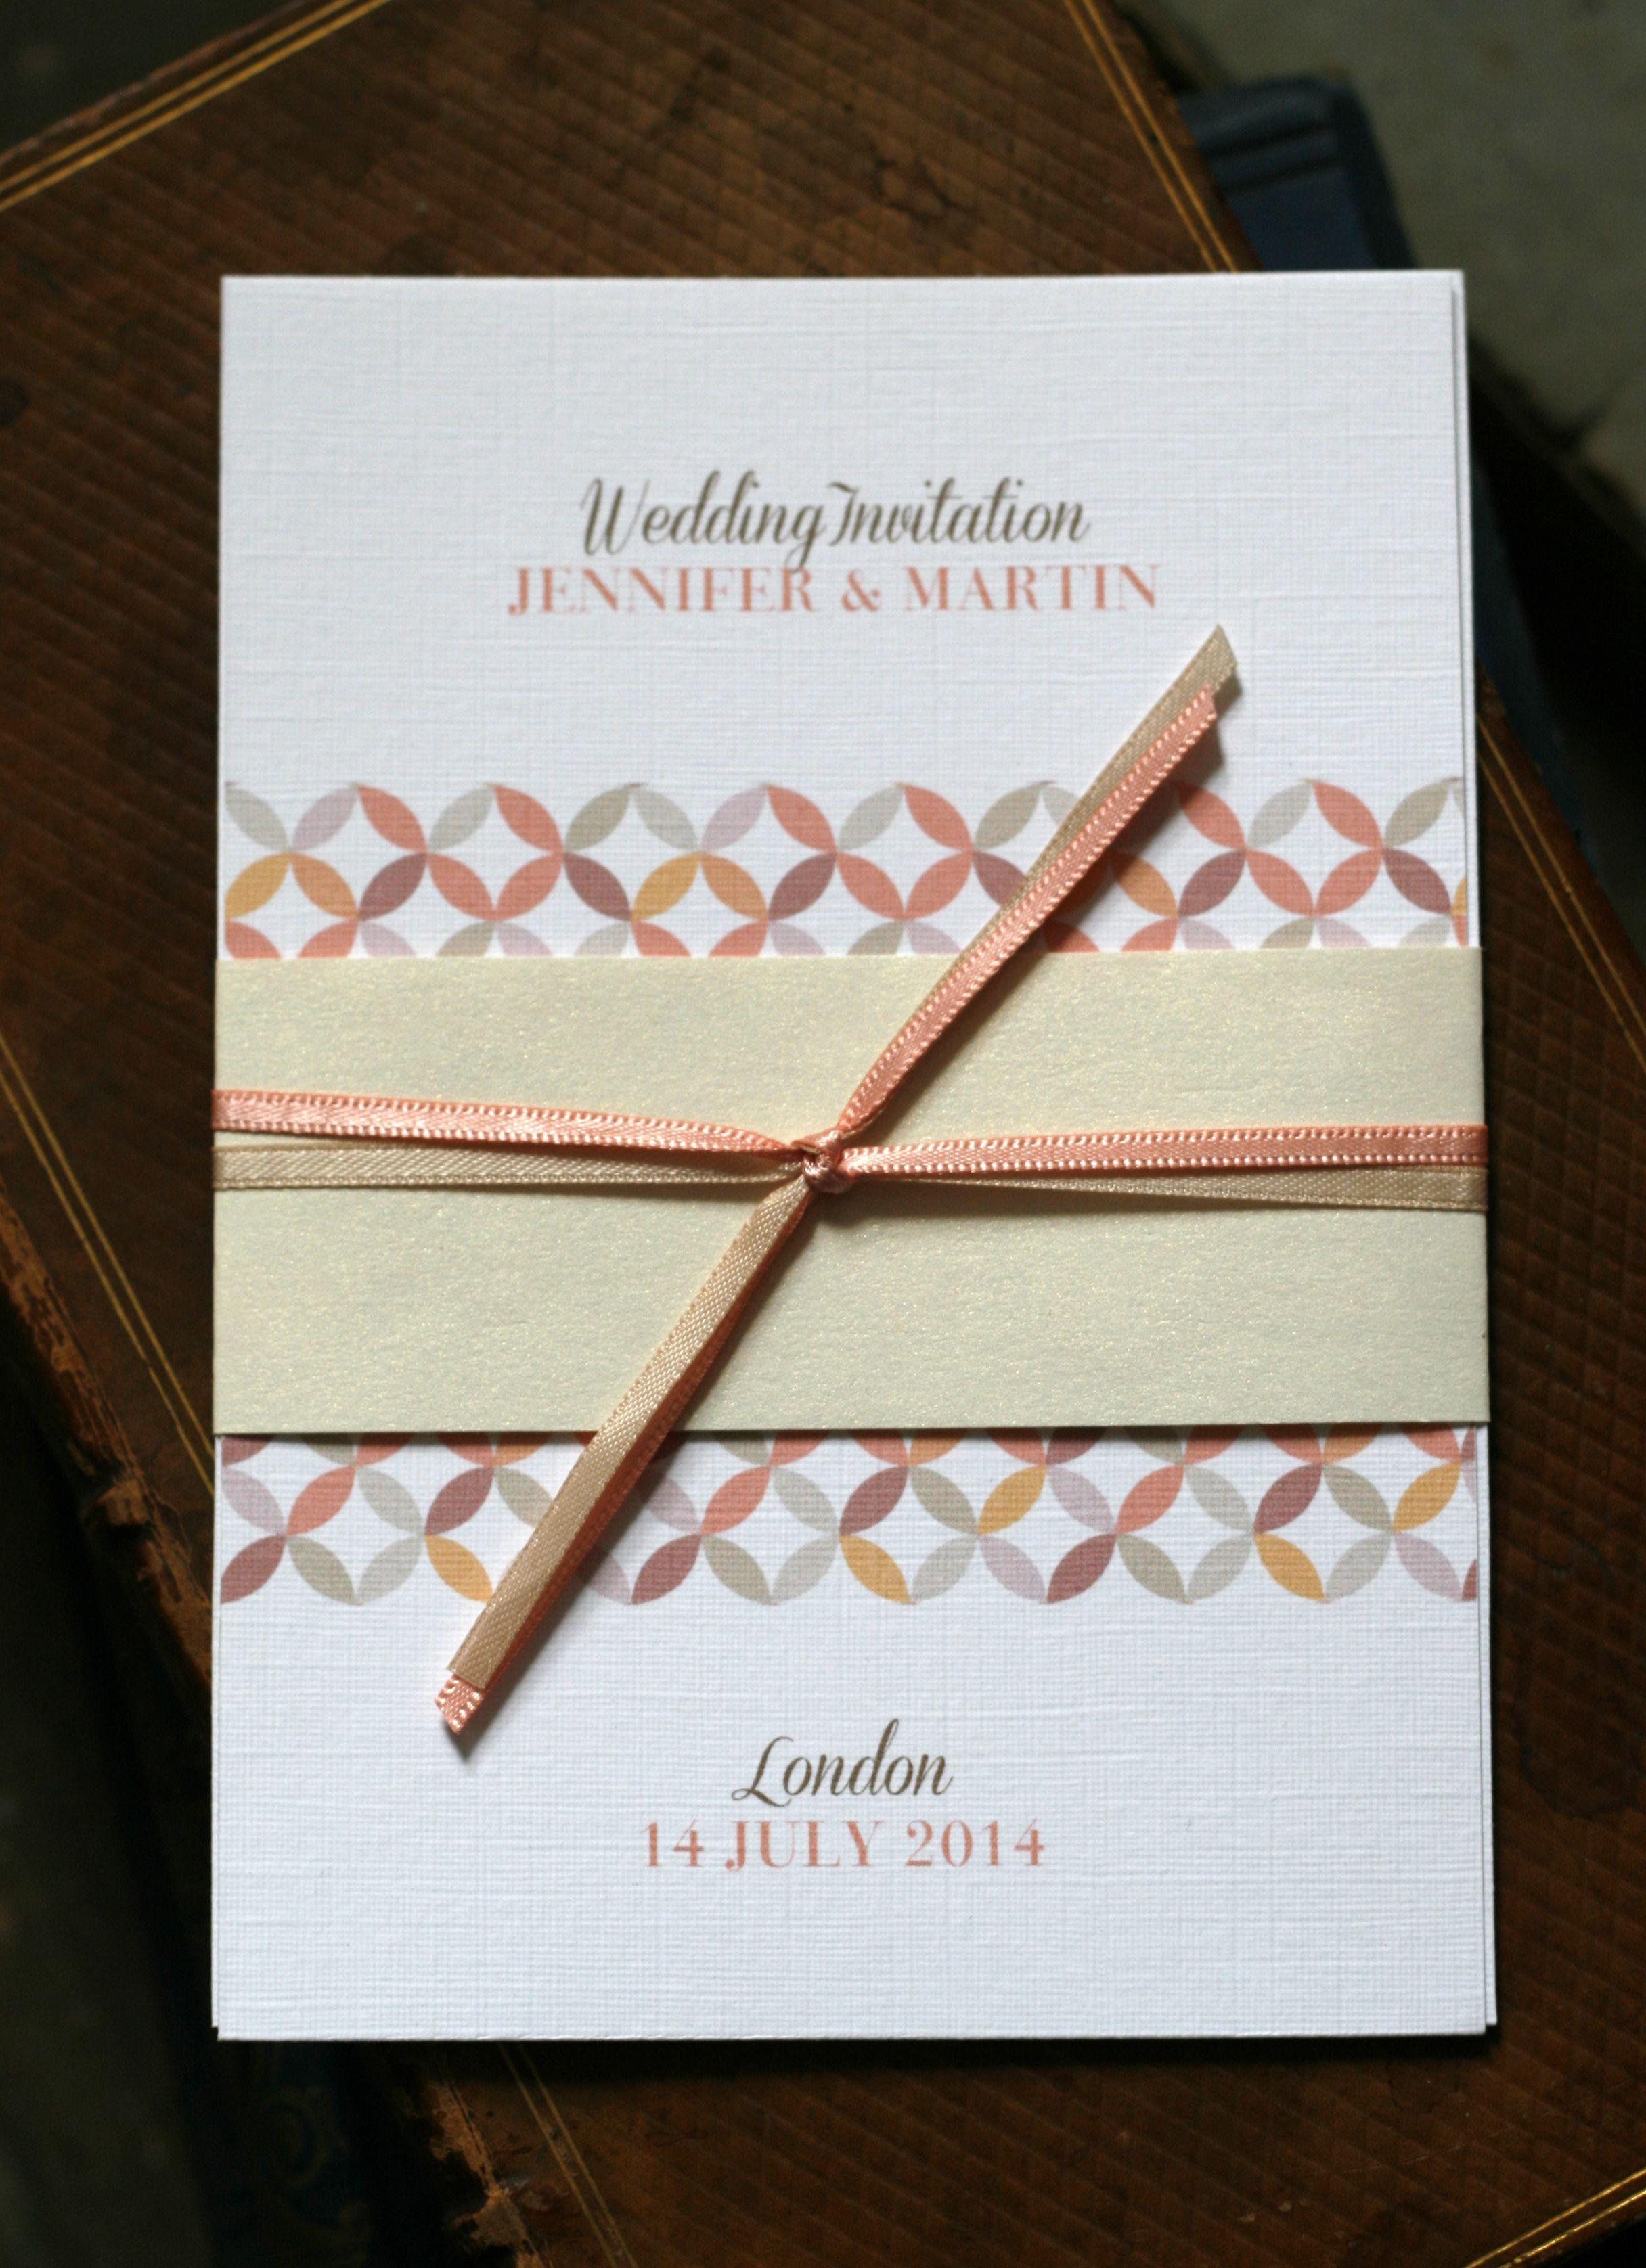 Modern mid century geometric wedding invitation in peach and light ...